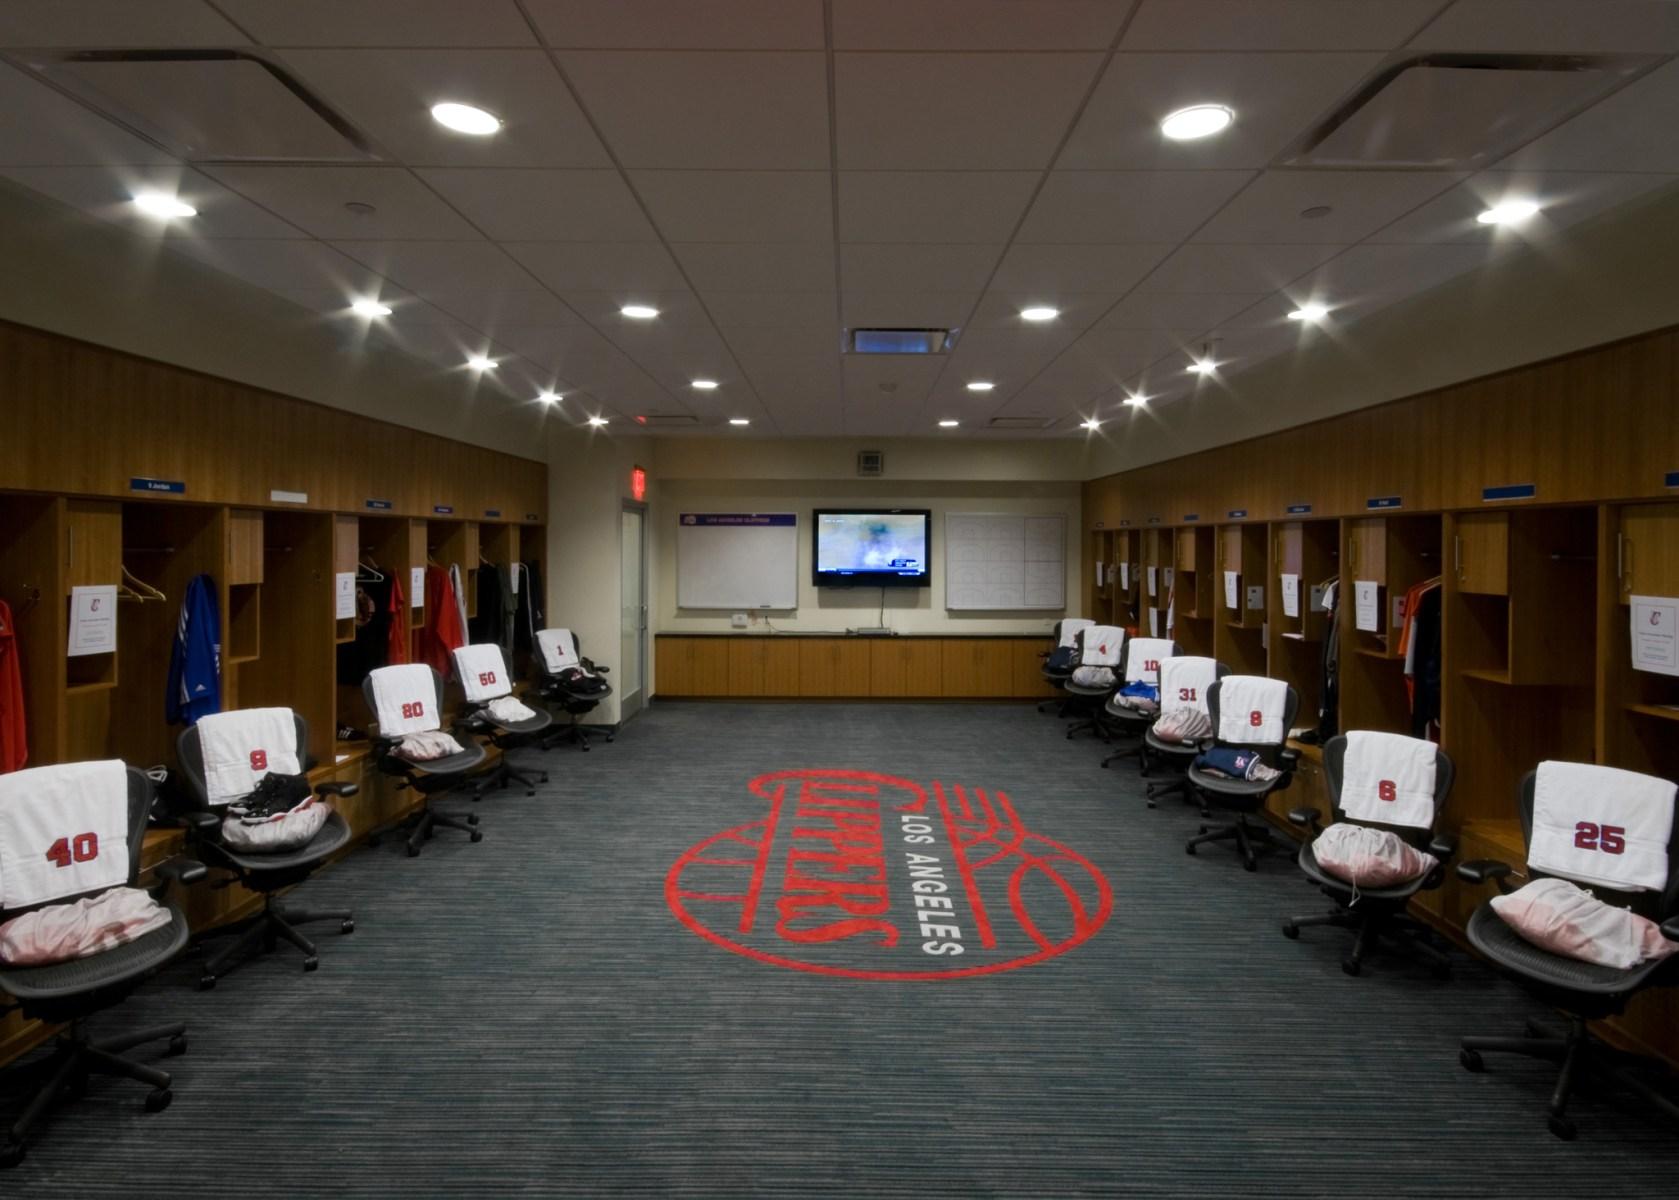 La Clippers Training Facility - Architizer